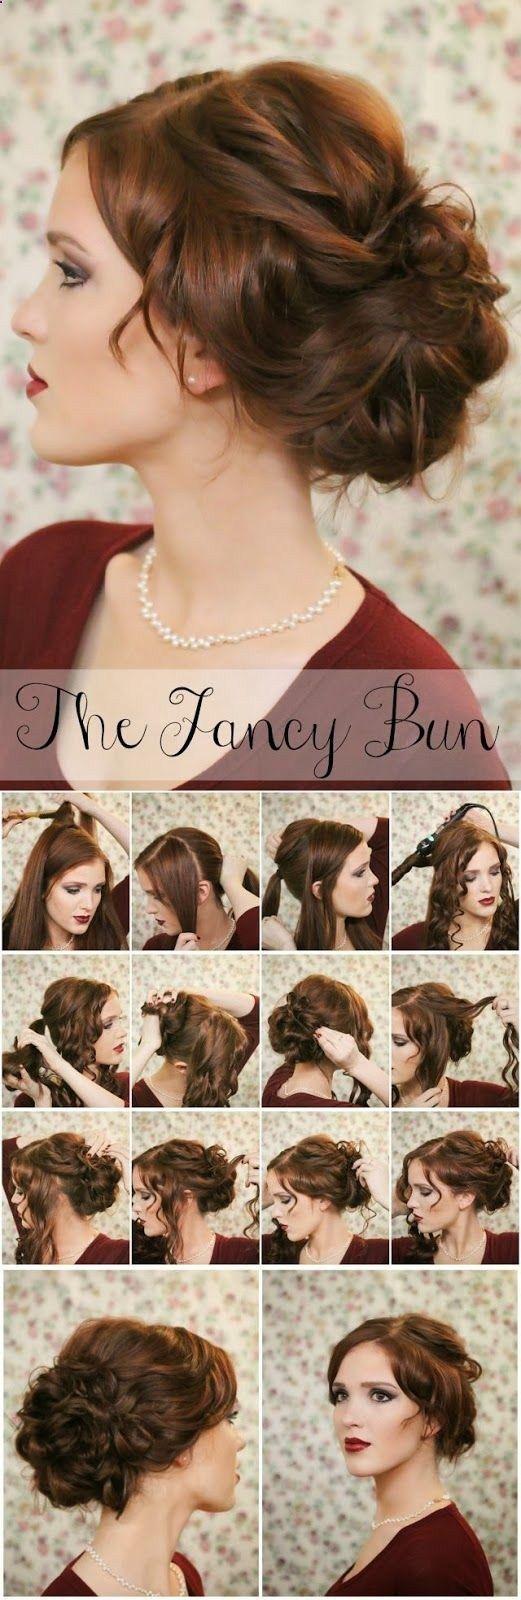 10 best diy wedding hairstyles with tutorials diy wedding 10 best diy wedding hairstyles with tutorials diy wedding tutorials and updo solutioingenieria Images